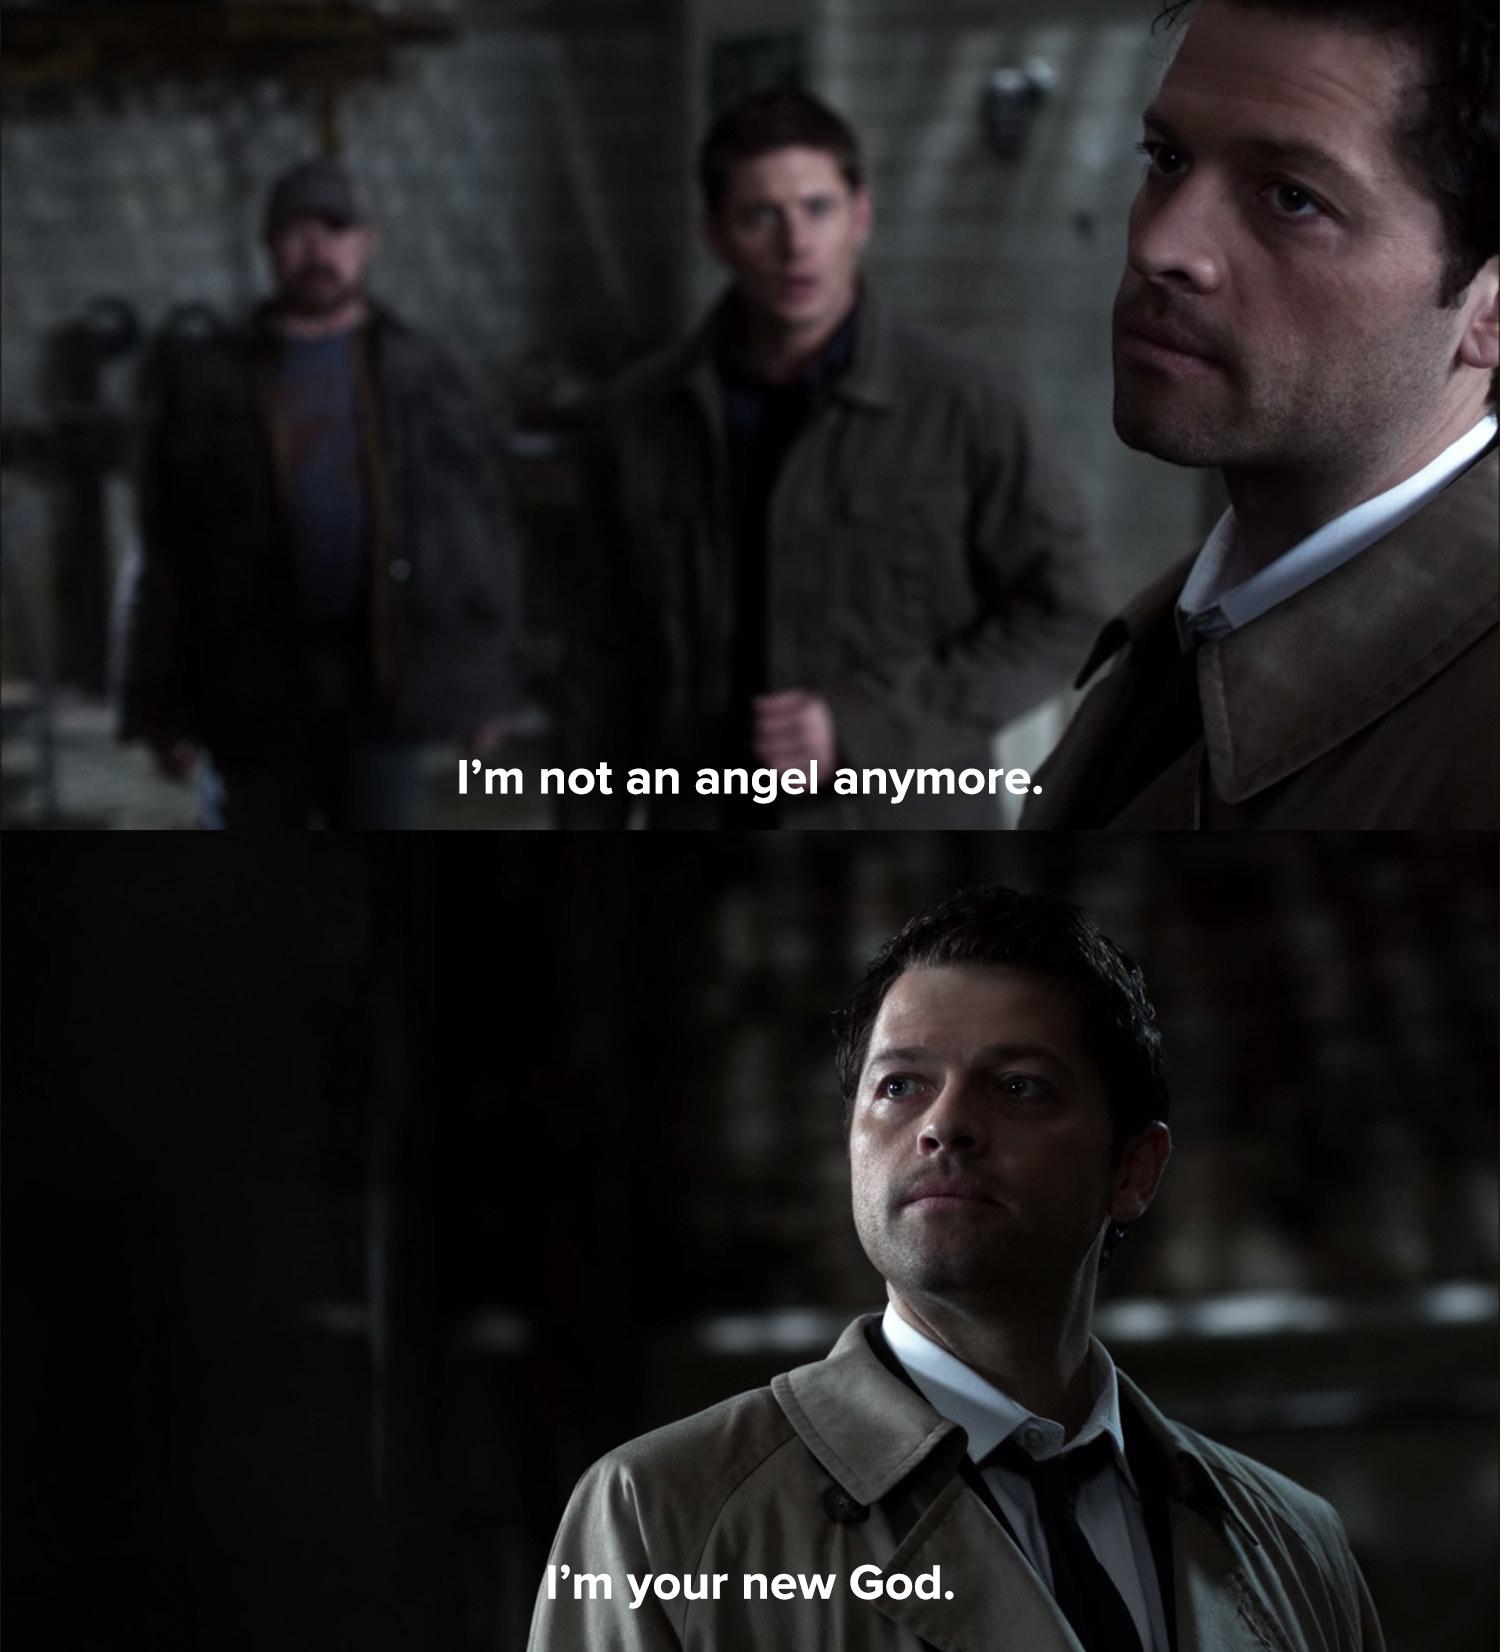 Castiel tells Dean he isn't an angel anymore